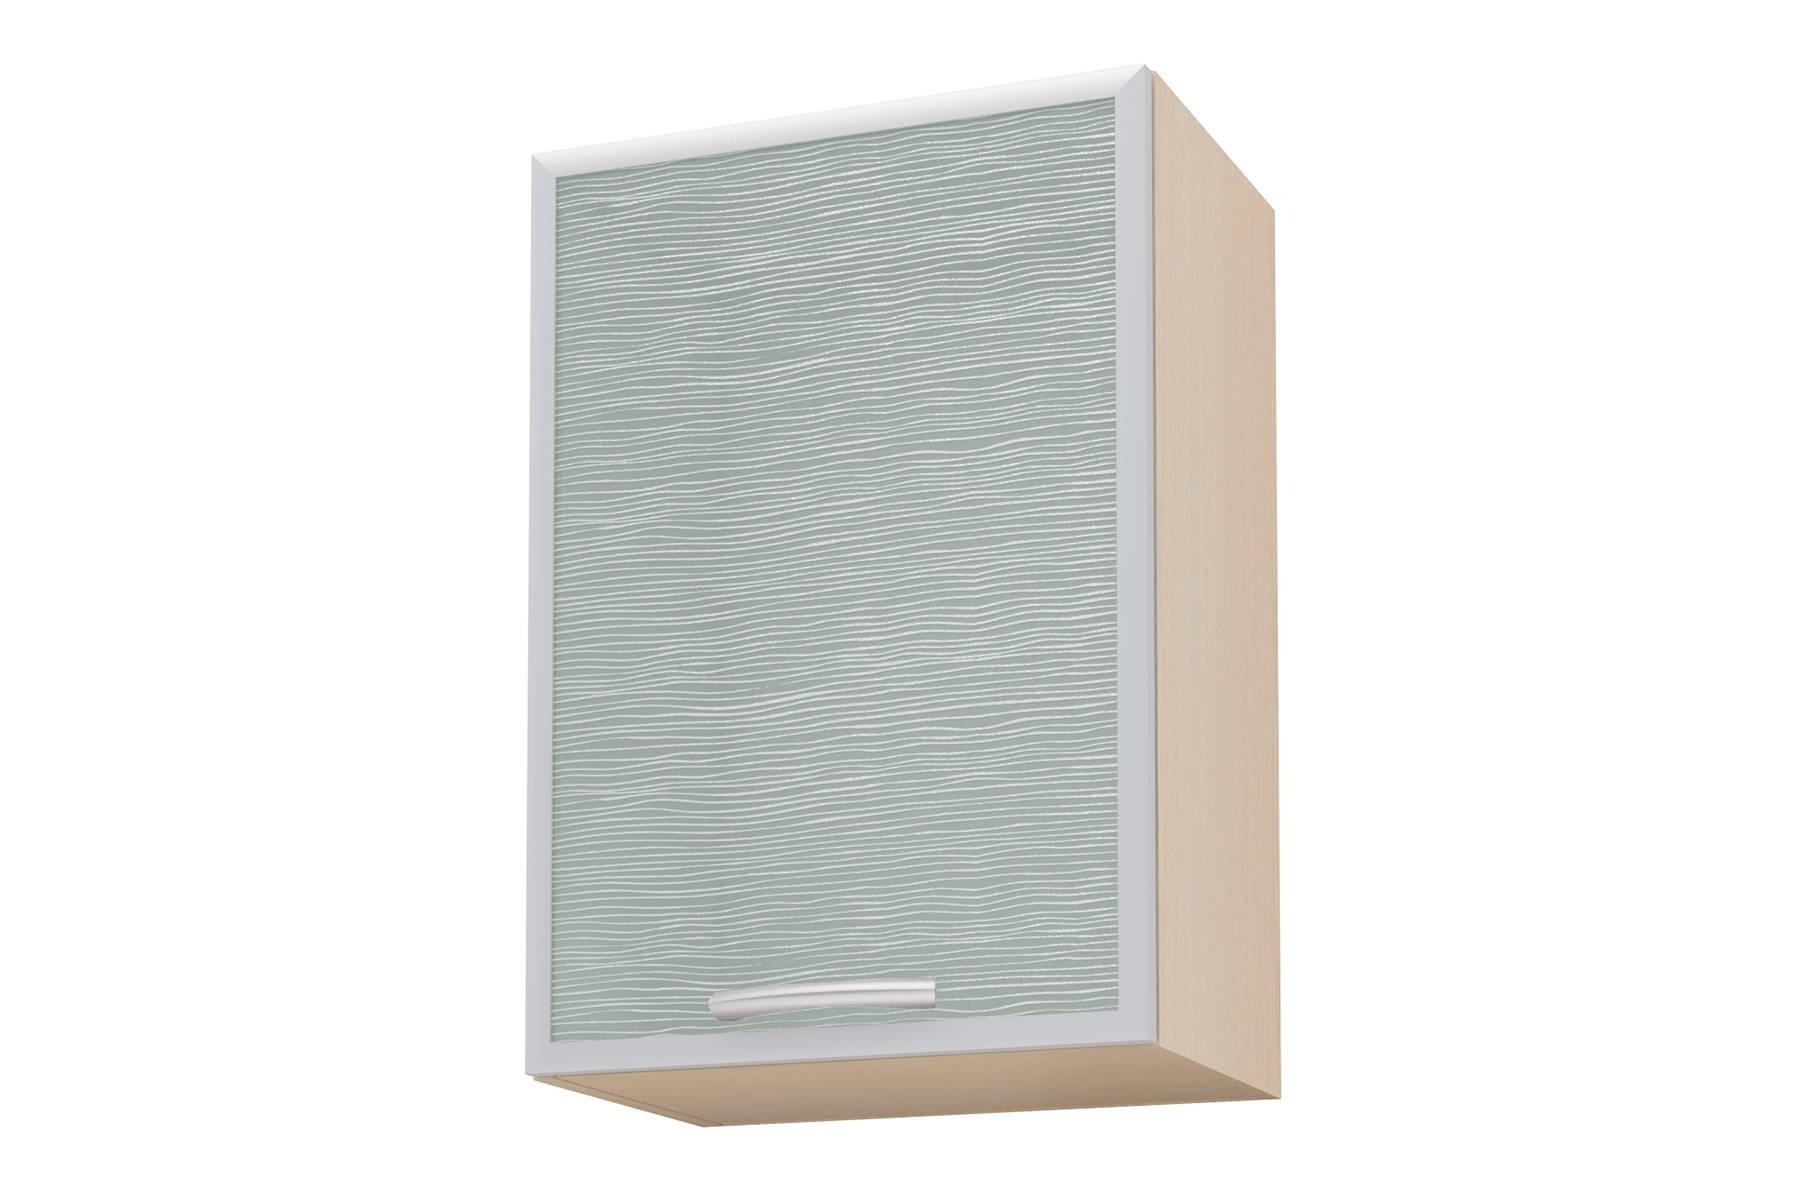 Селена шкаф навесной ш.500, фасад левый графин боярский 500 мл ш 18 500 907736